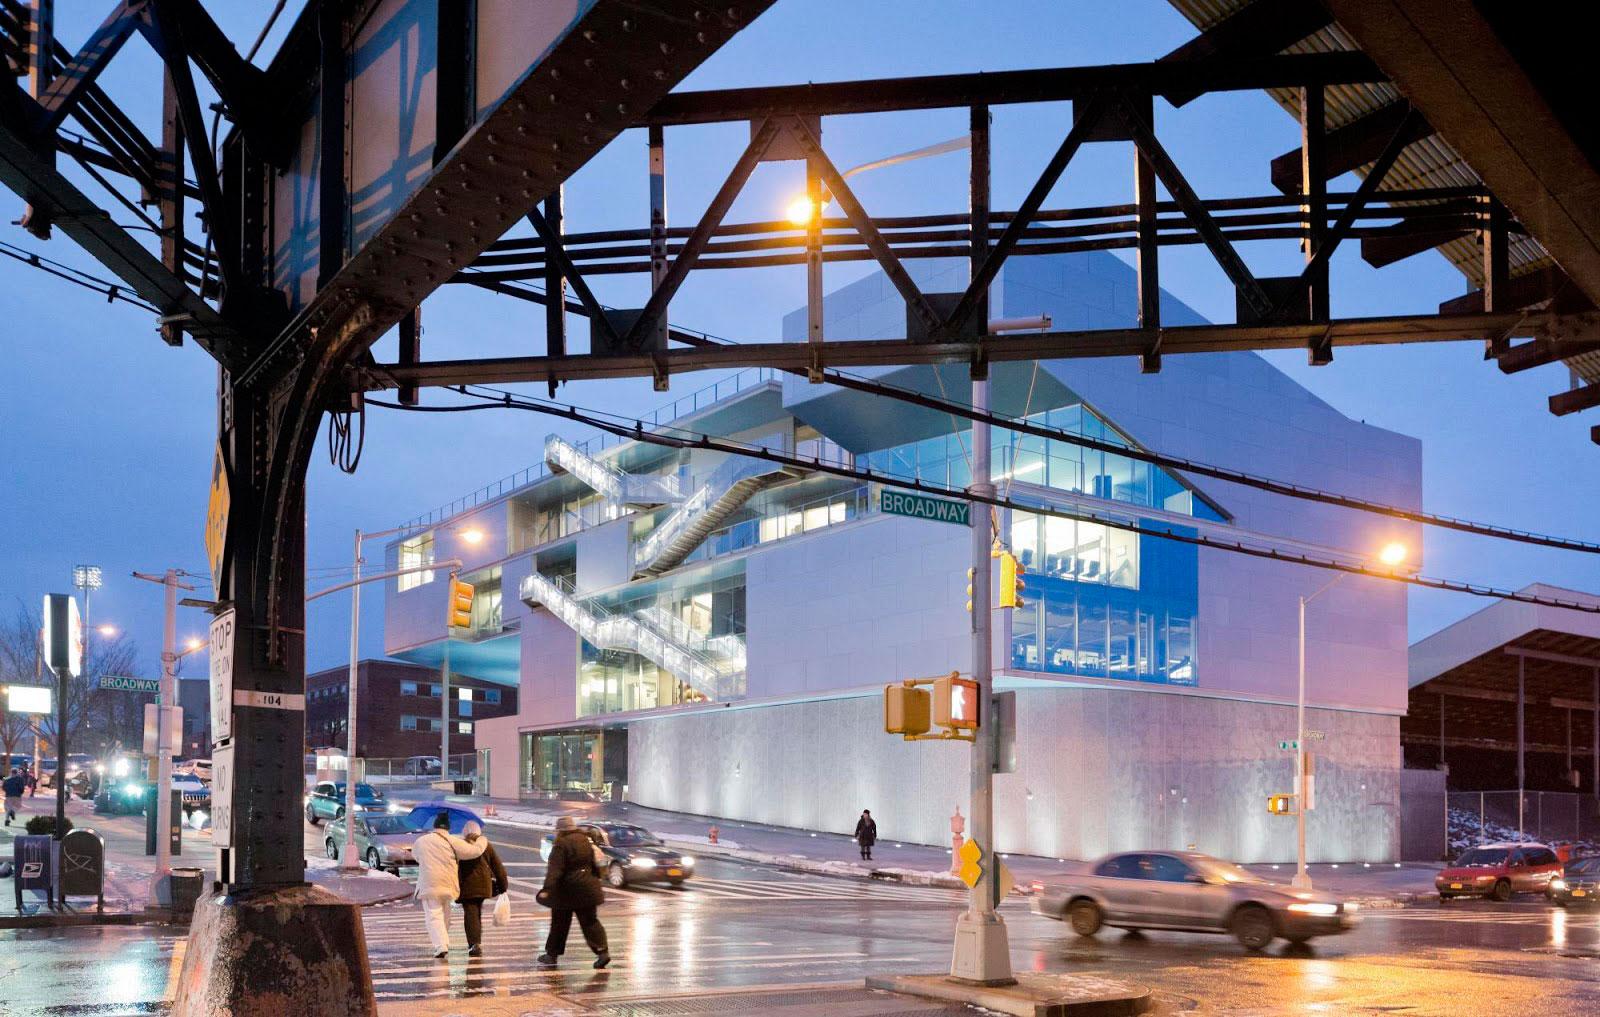 Campbell Sports Center por Steven Holl Architects. Fotografía © Iwan Baan